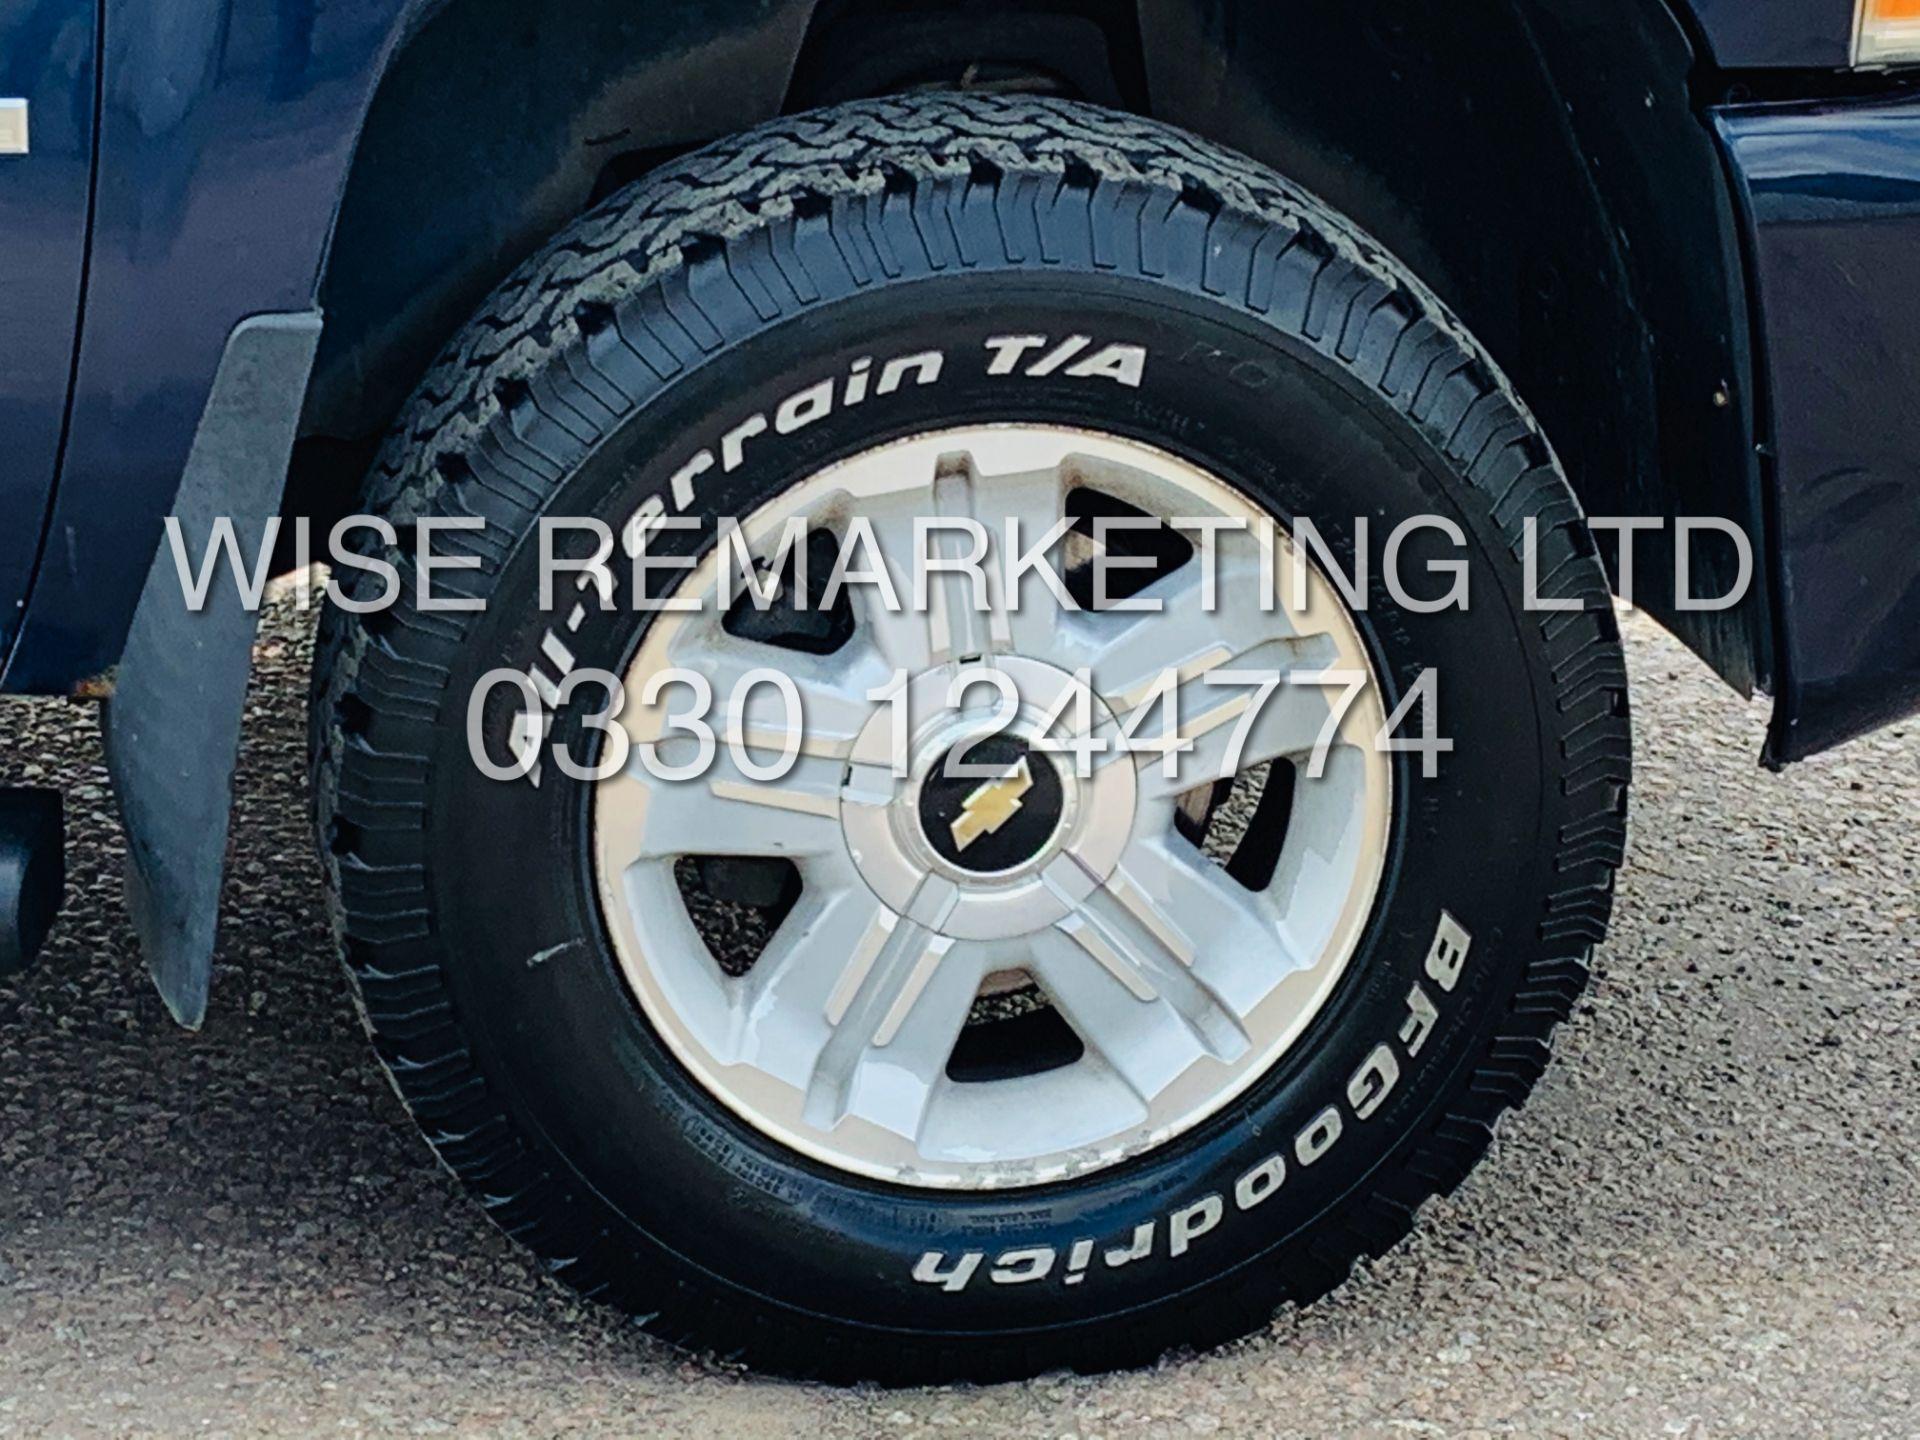 Lot 3A - ***RESERVE MET*** CHEVROLET SILVERADO 5.8L V8 LT1 KING-CAB Z71 EDTION**4X4 2007 YEAR**LOW MILES